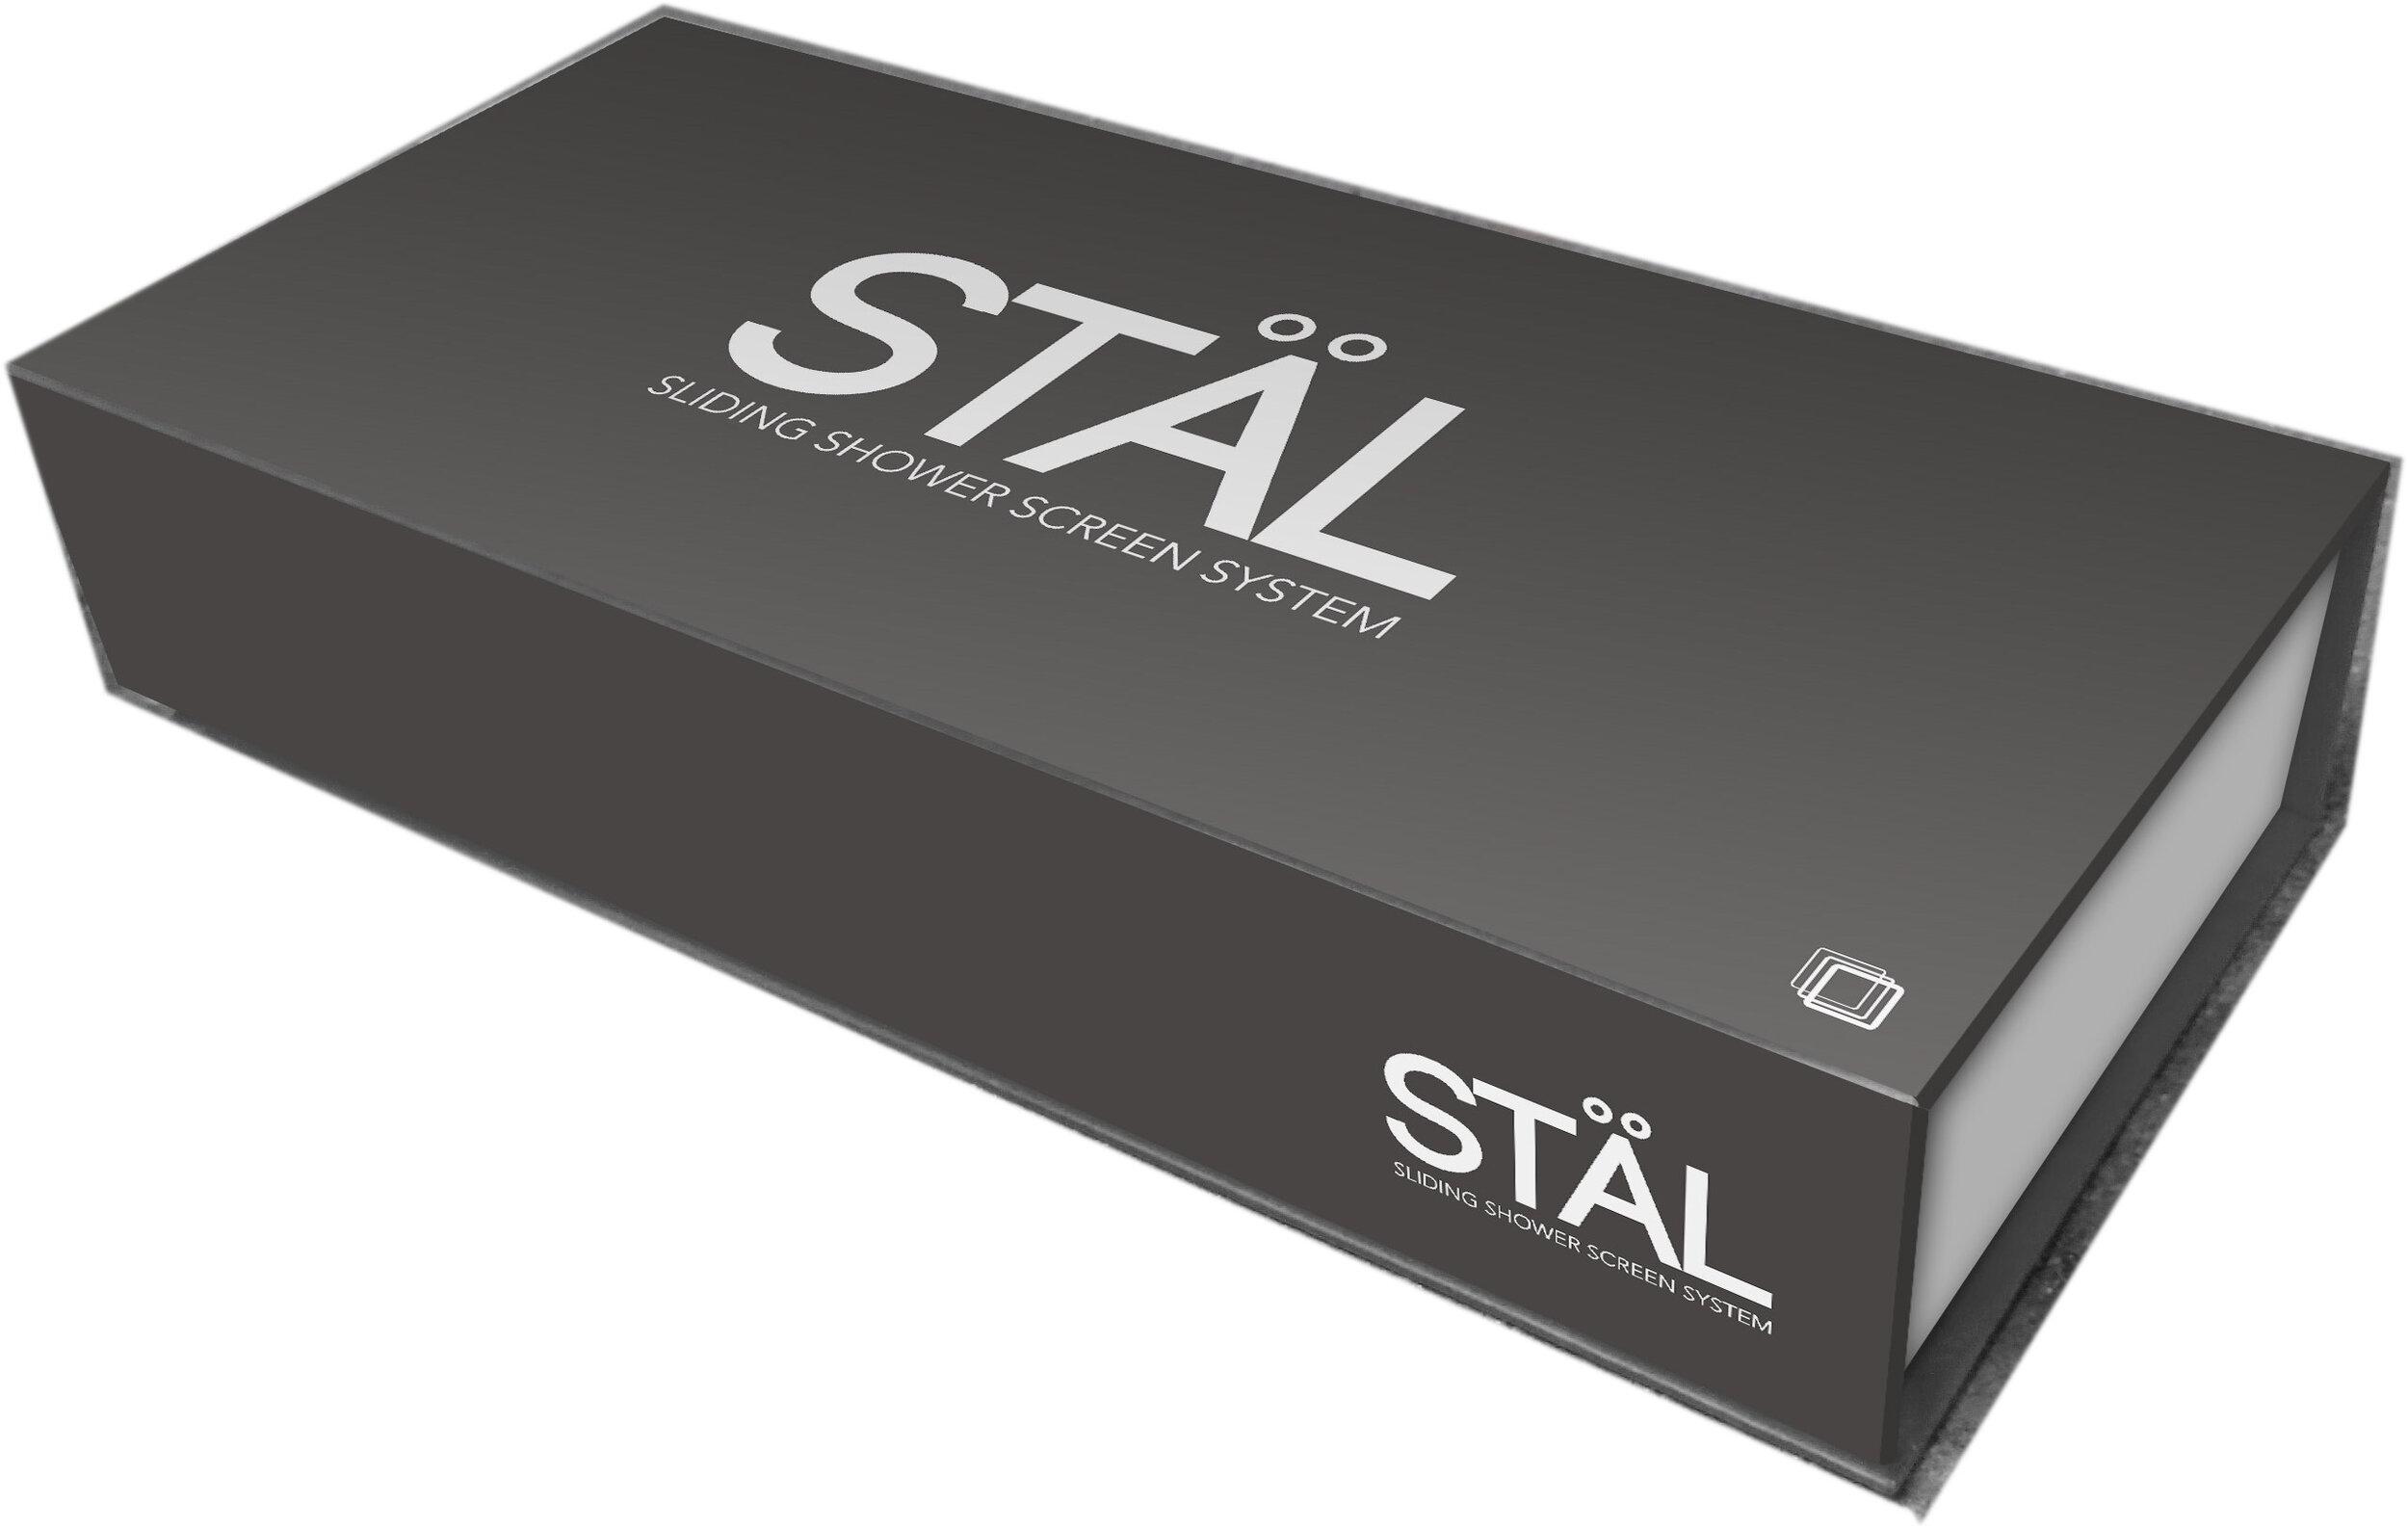 stal-box.jpg